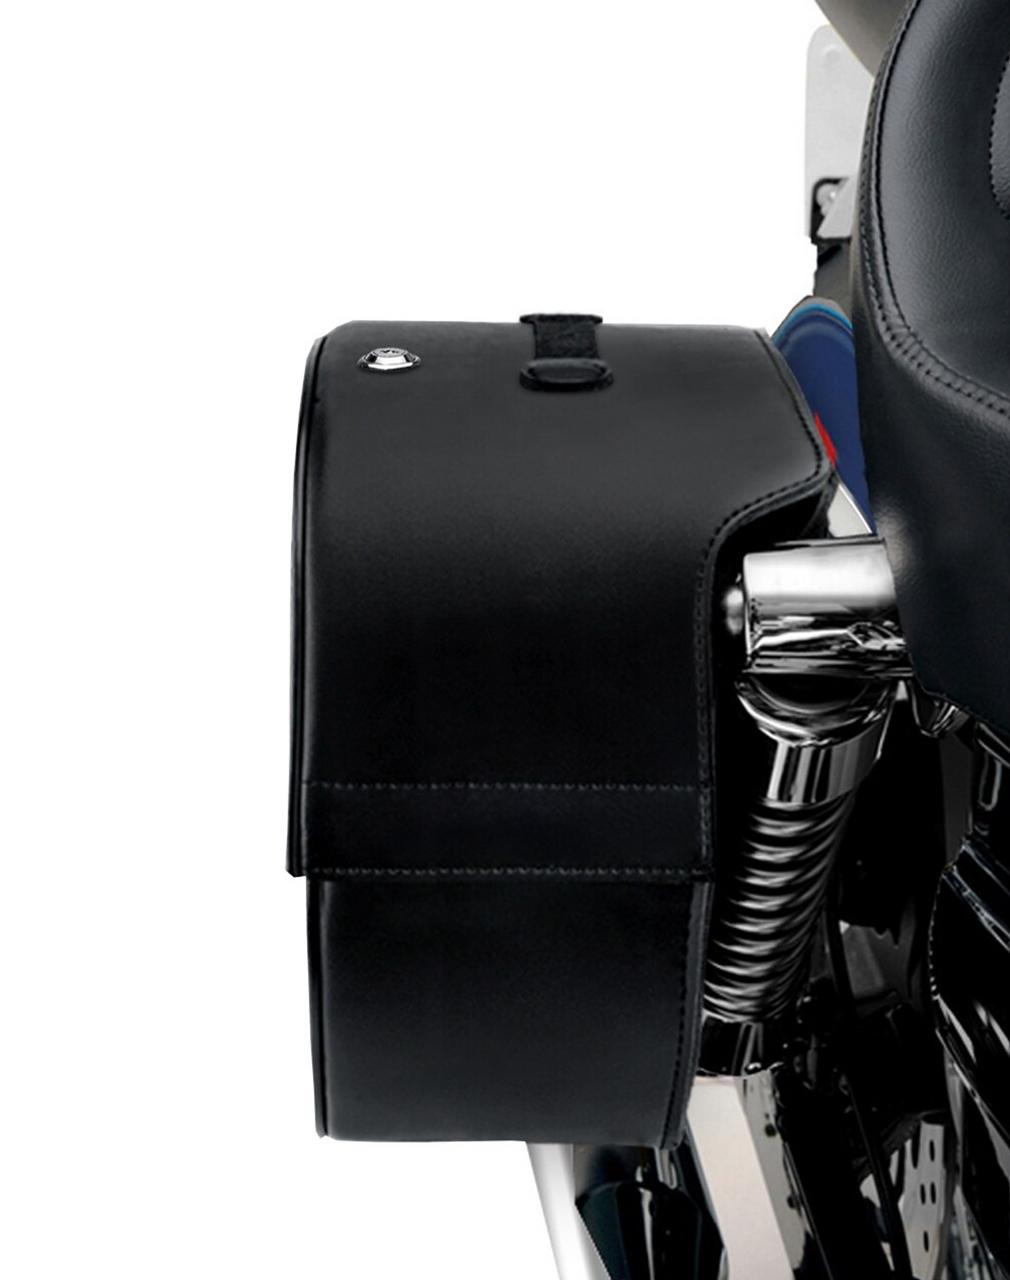 Honda Magna 750 Armor Shock Cutout Studded Motorcycle Saddlebags shock cutout view